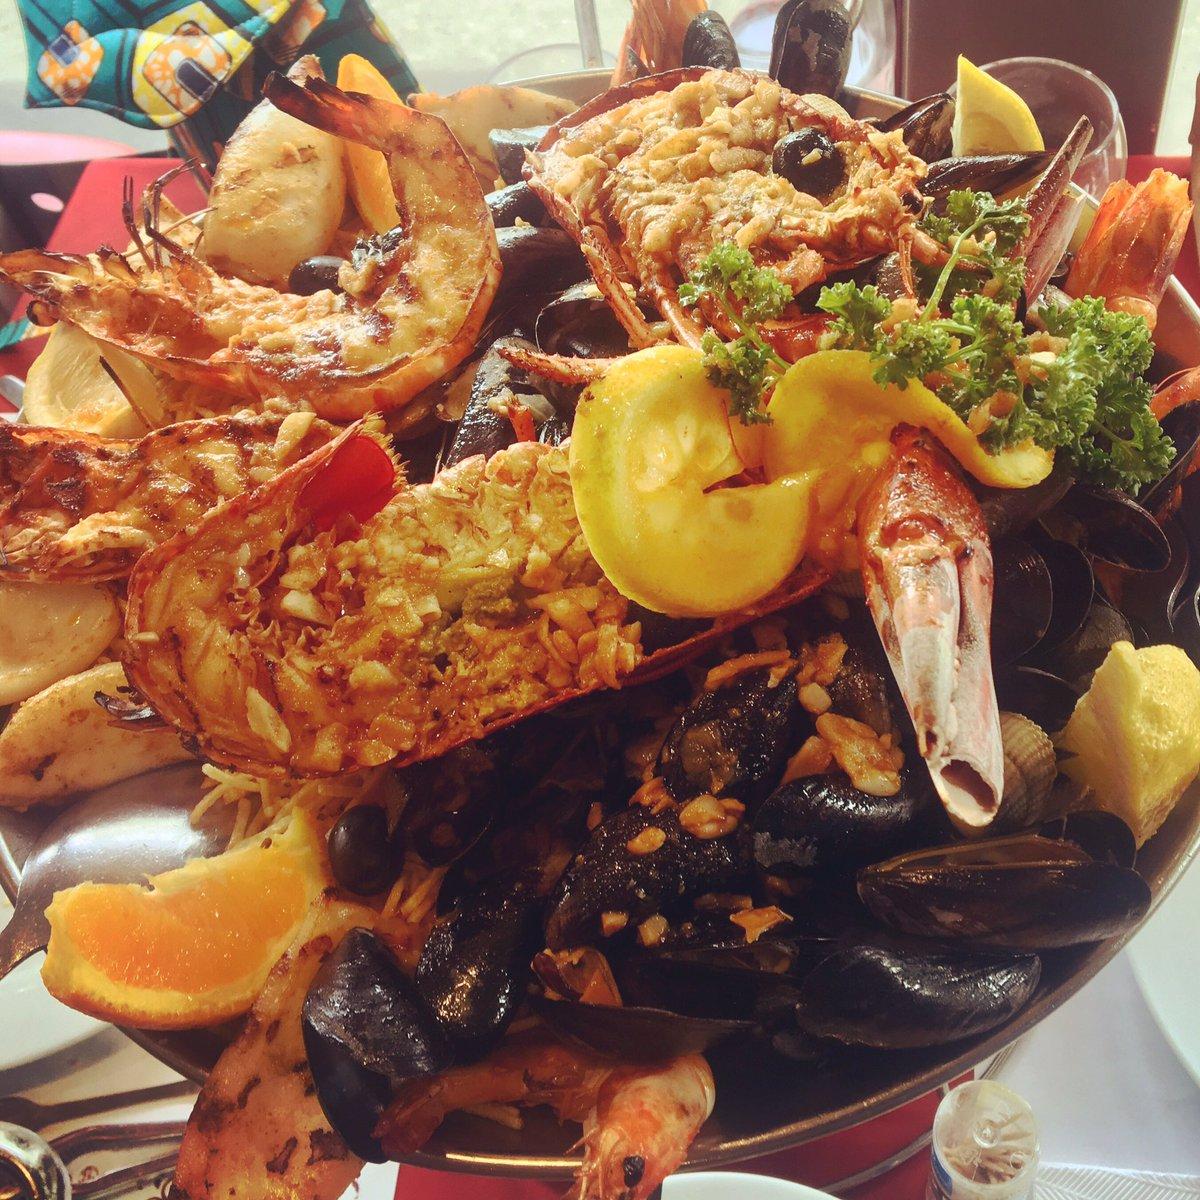 Quand on te fait découvrir le #PedraAlta… #bondimanche #instafood #yummy #miammiam pic.twitter.com/BCOZyw6gmI